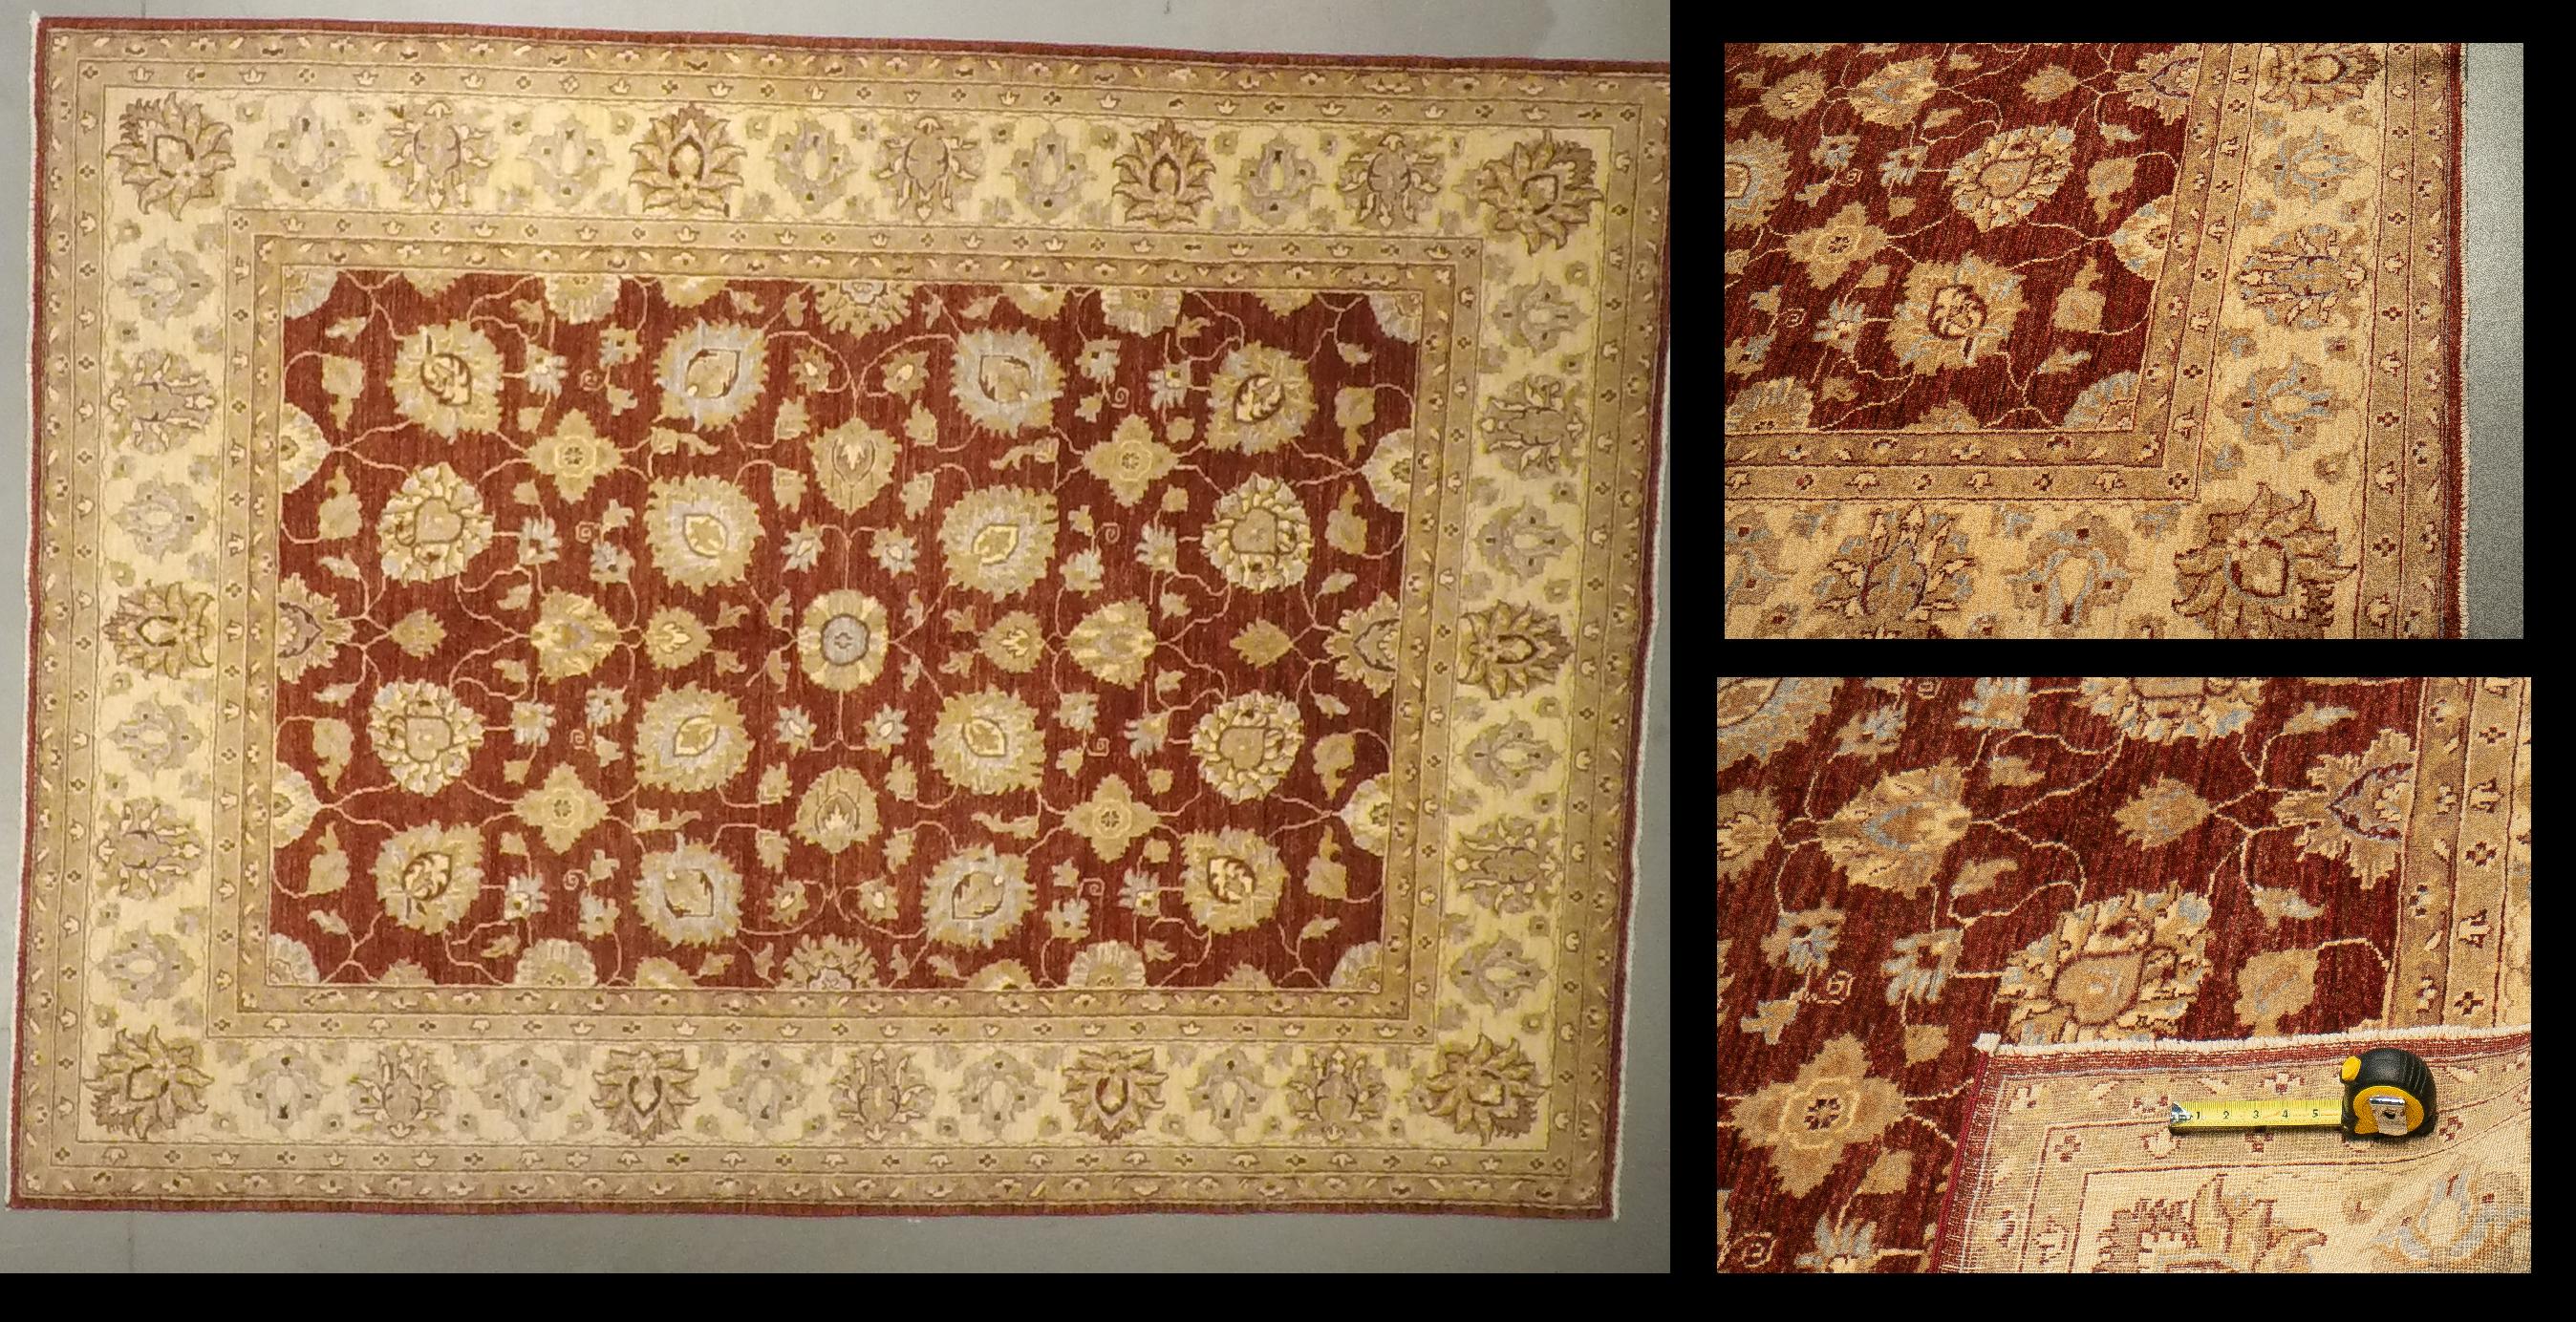 LD37 3718 (6.9 x 9.2) Wool-Handmade